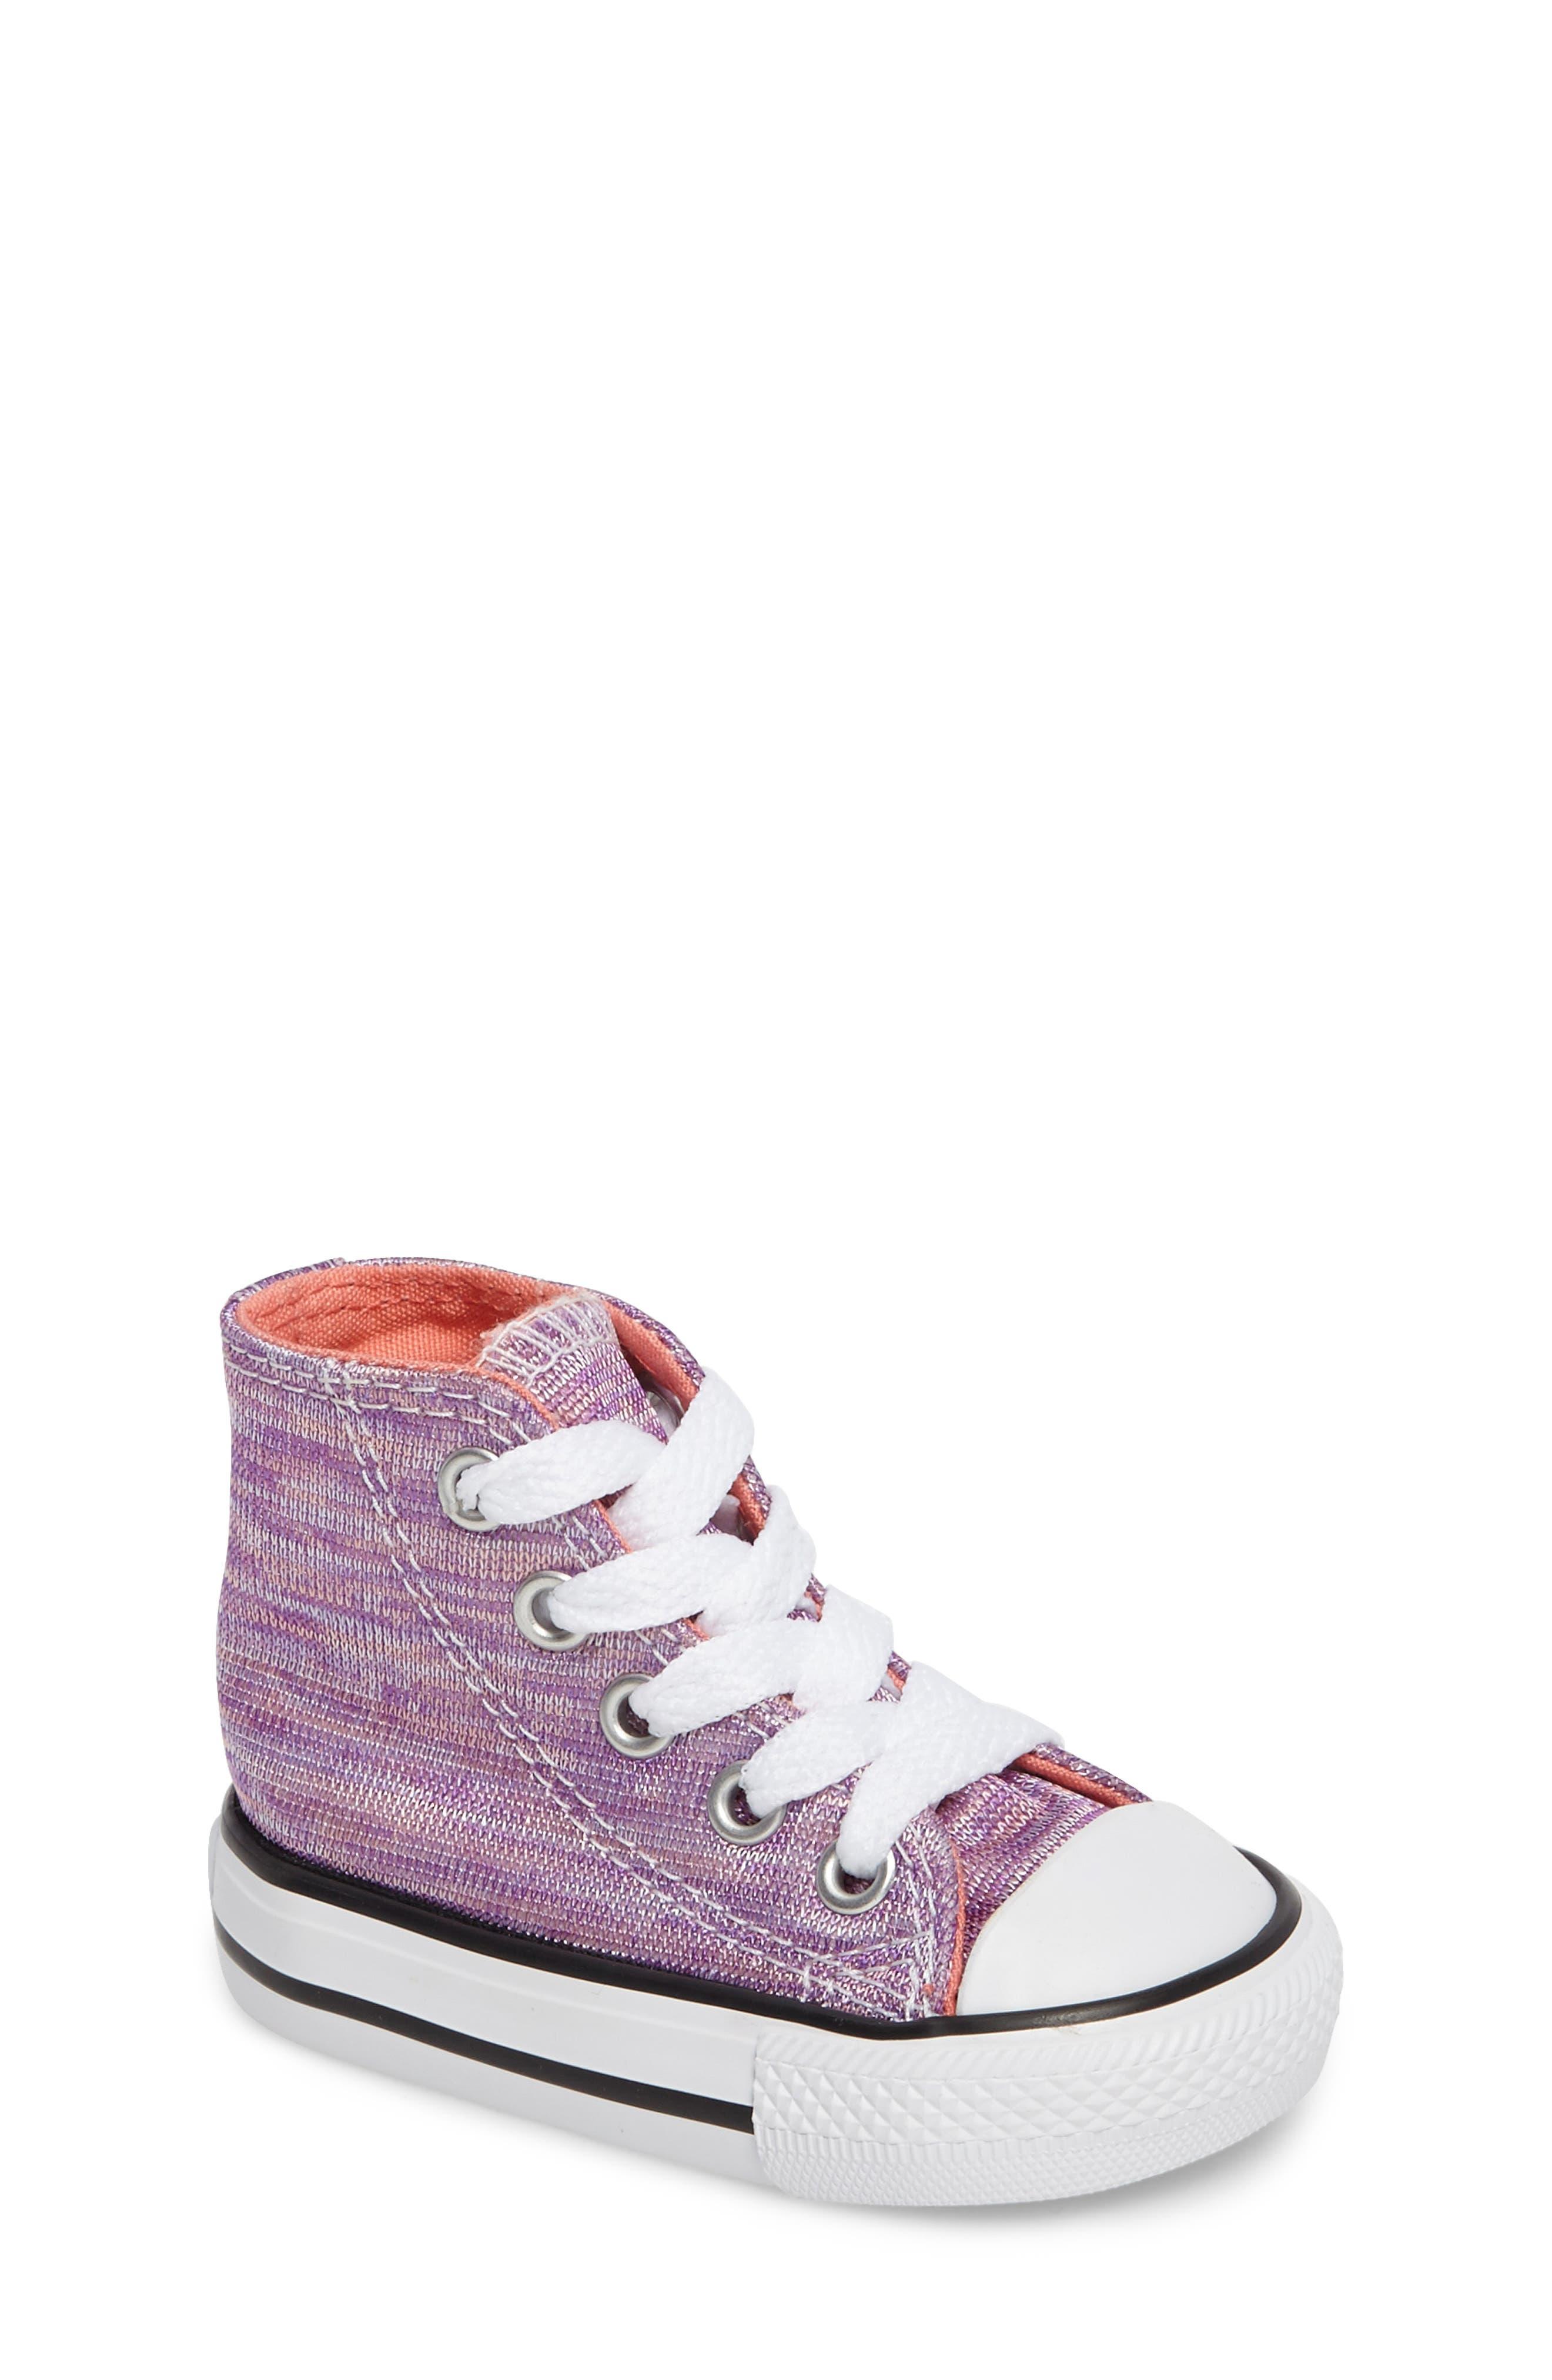 Main Image - Converse Chuck Taylor® All Star® Knit High Top Sneaker (Baby, Walker, Toddler & Little Kid)